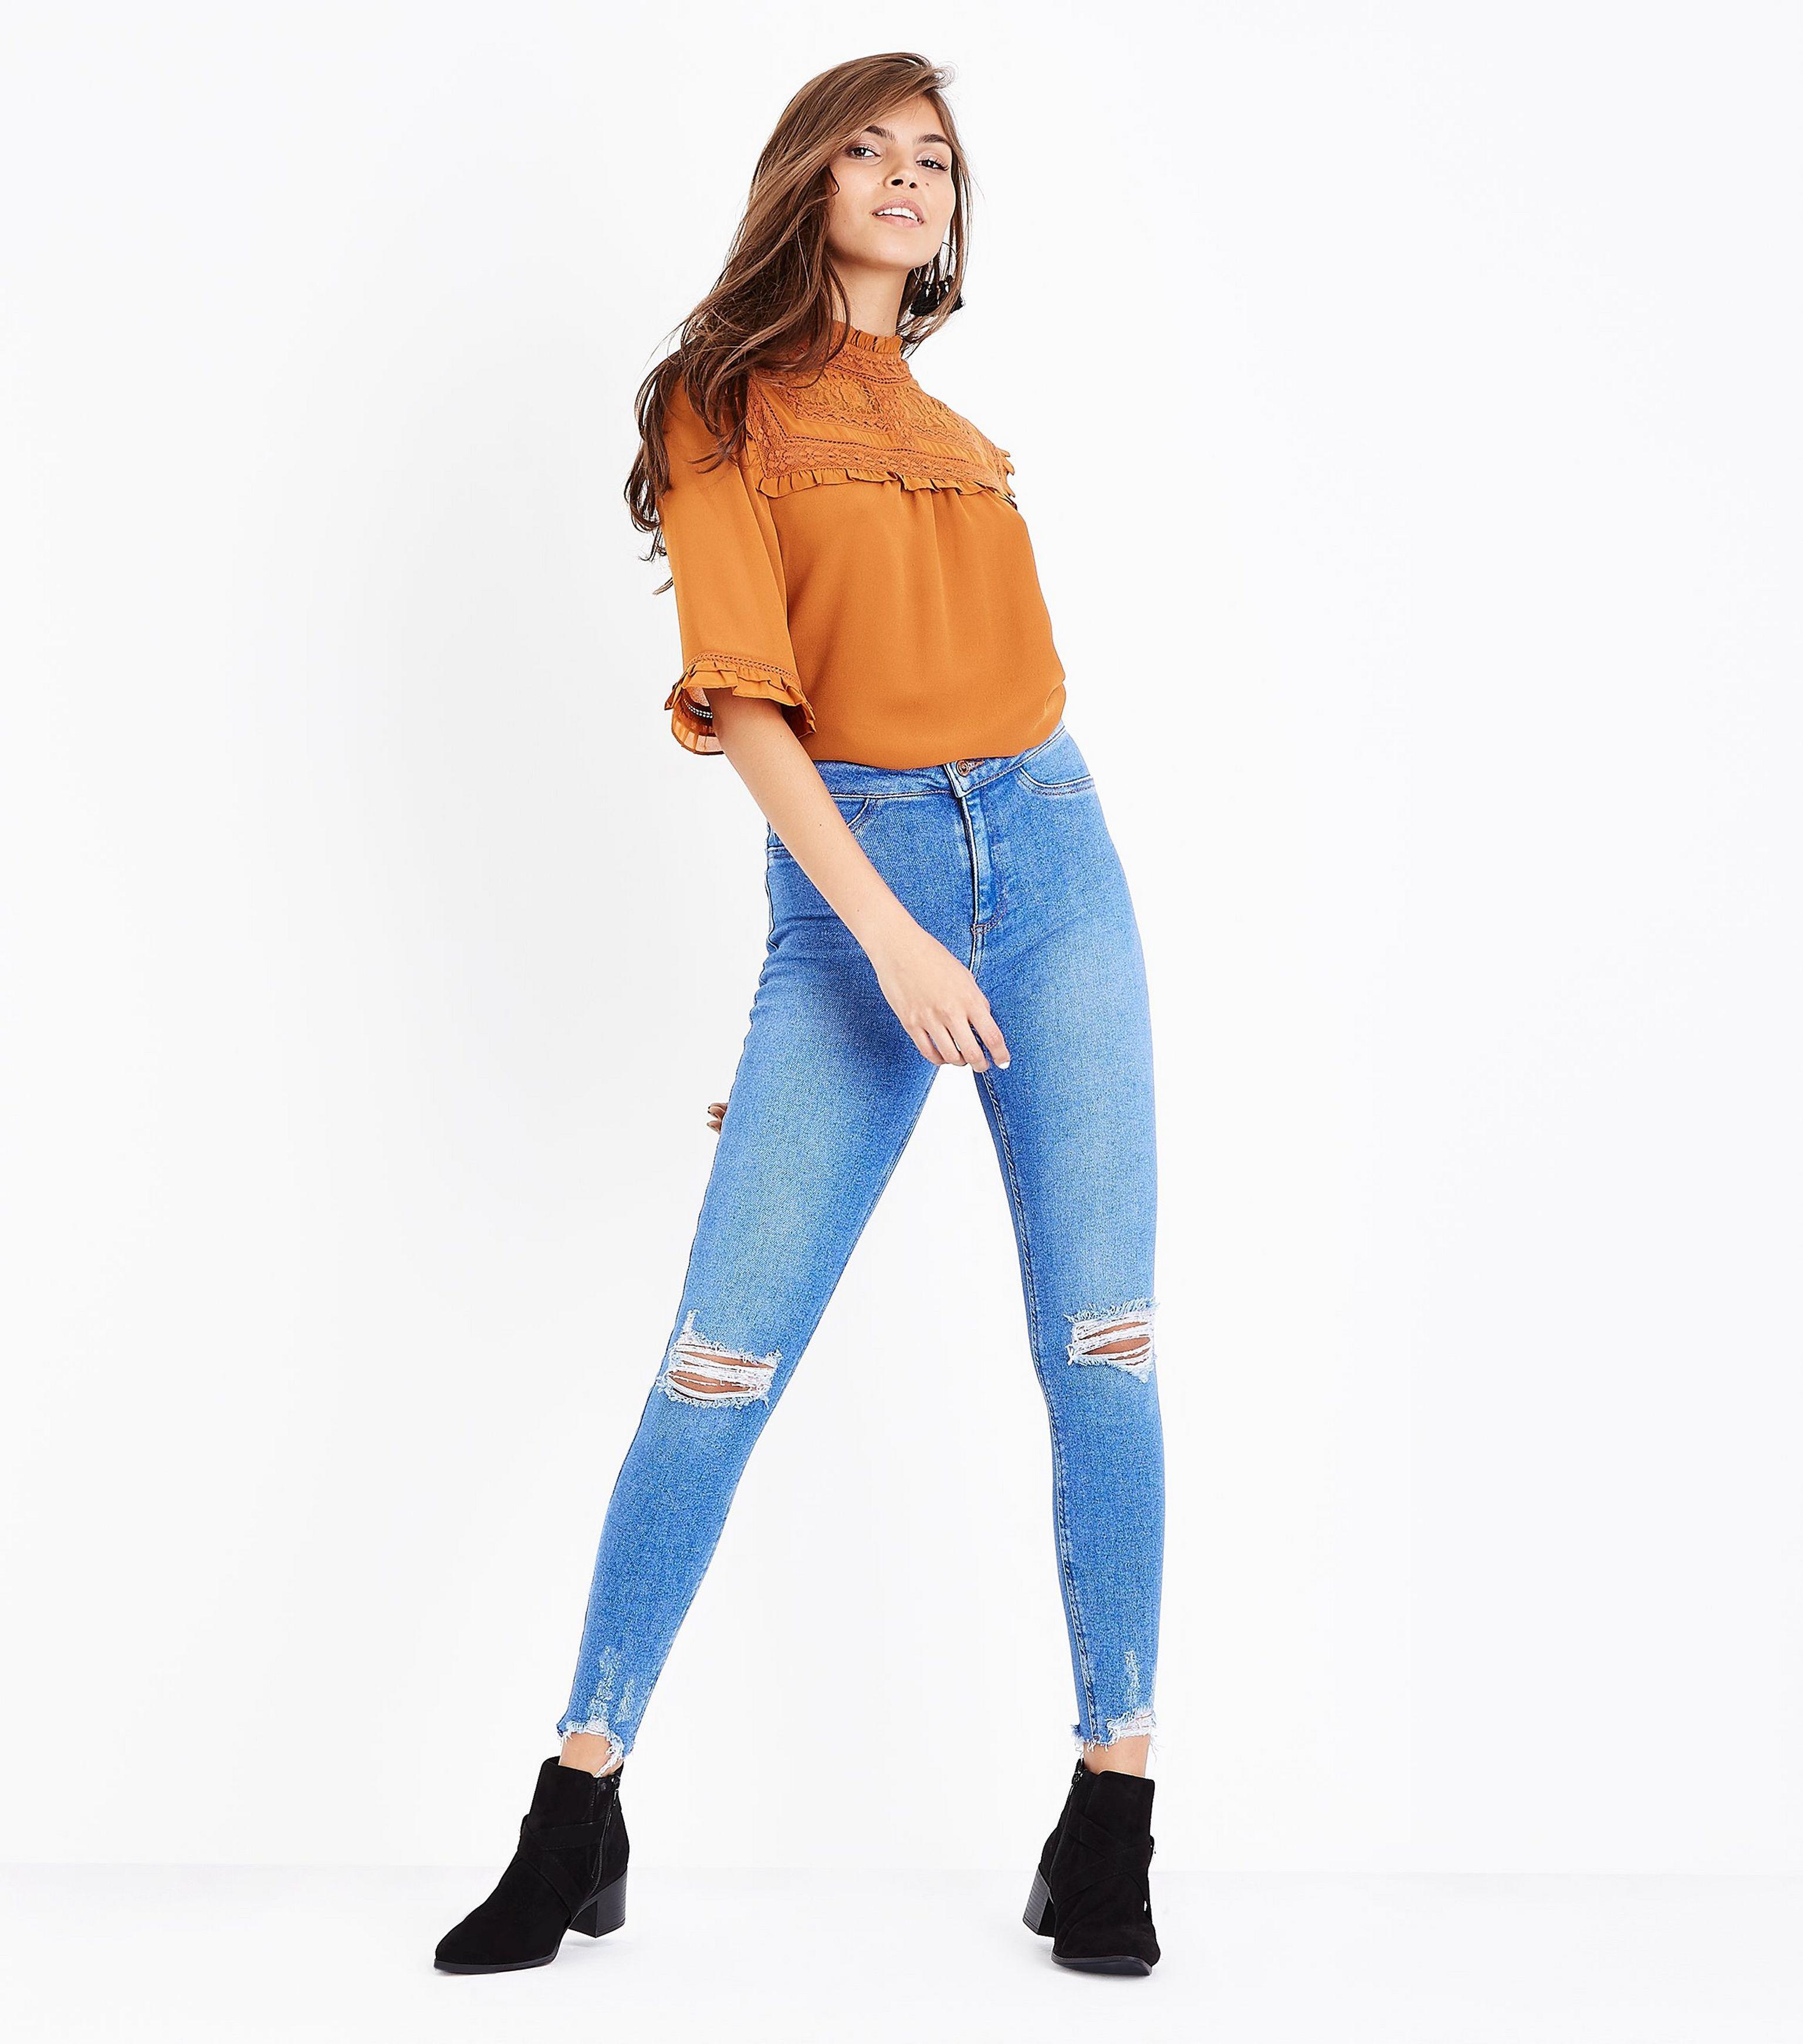 25ff63ec734 New Look Blue Ripped Knee Fray Hem Skinny Jenna Jeans in Blue - Lyst